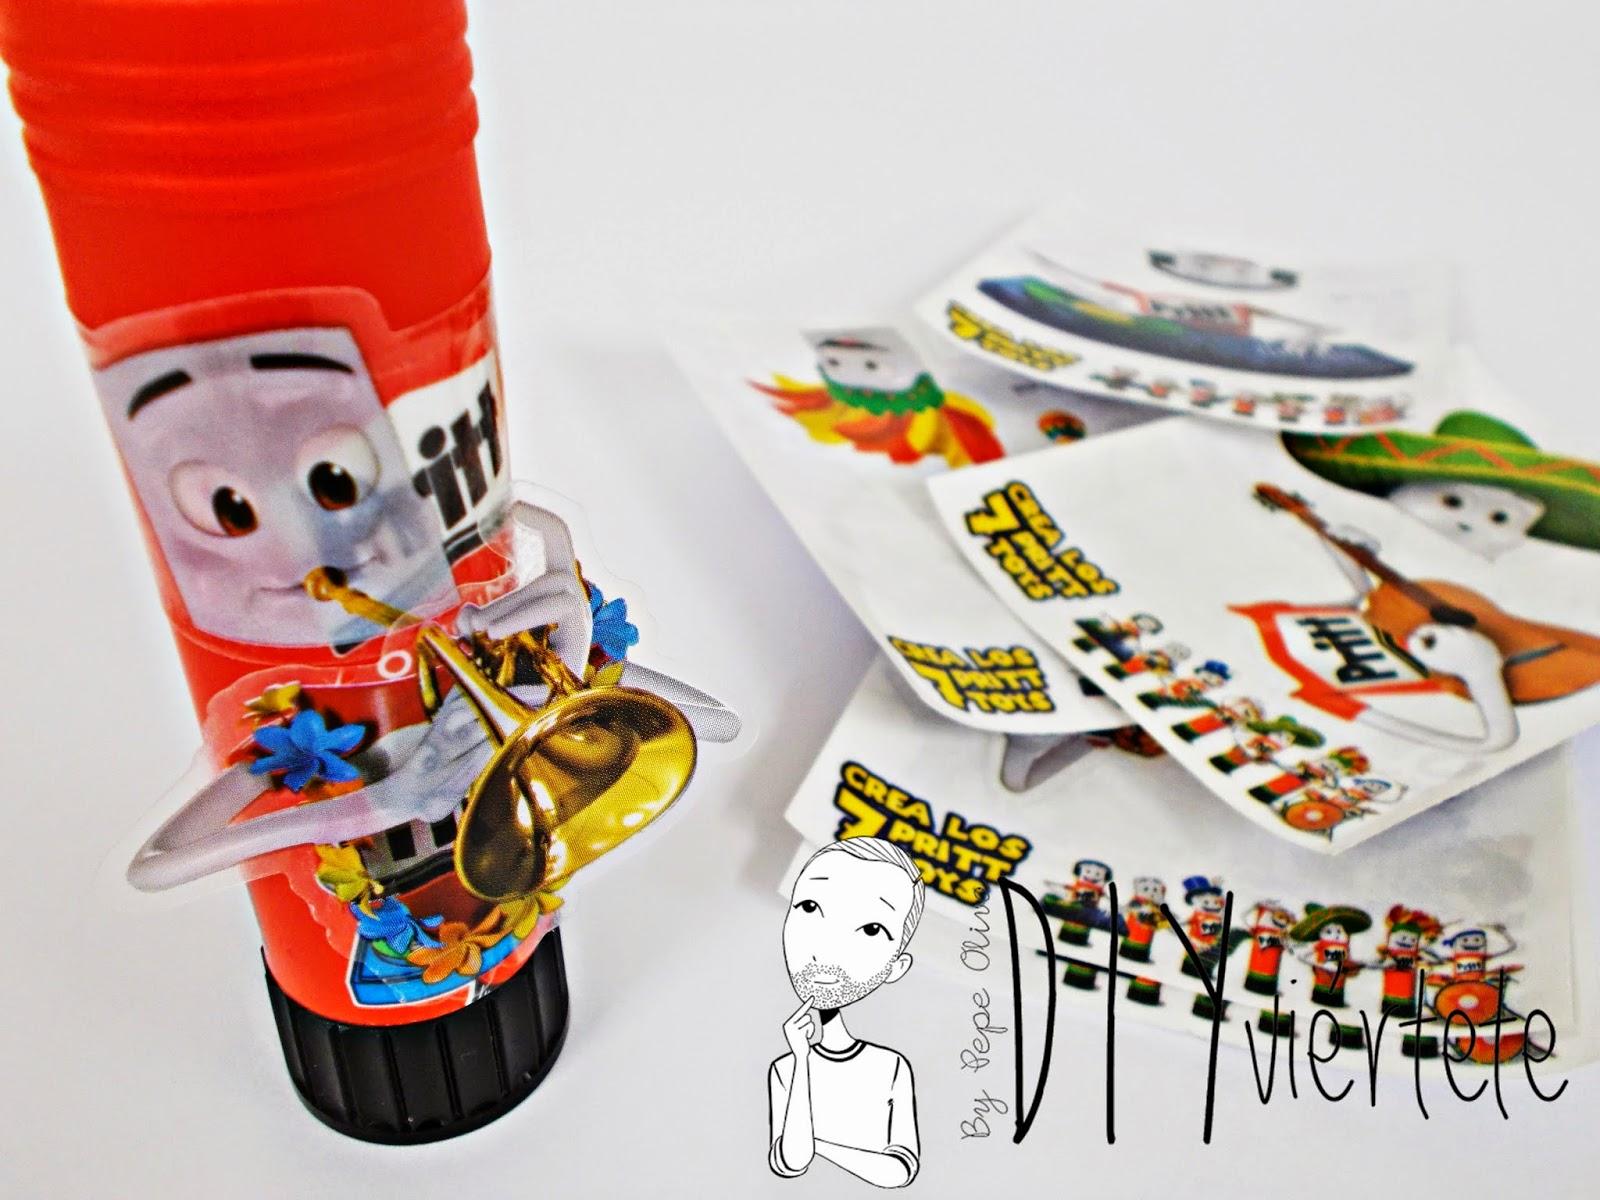 DIY-manualidades-pegamento-adhesivo-barra-Pritt-papertoy-recortables- (1)